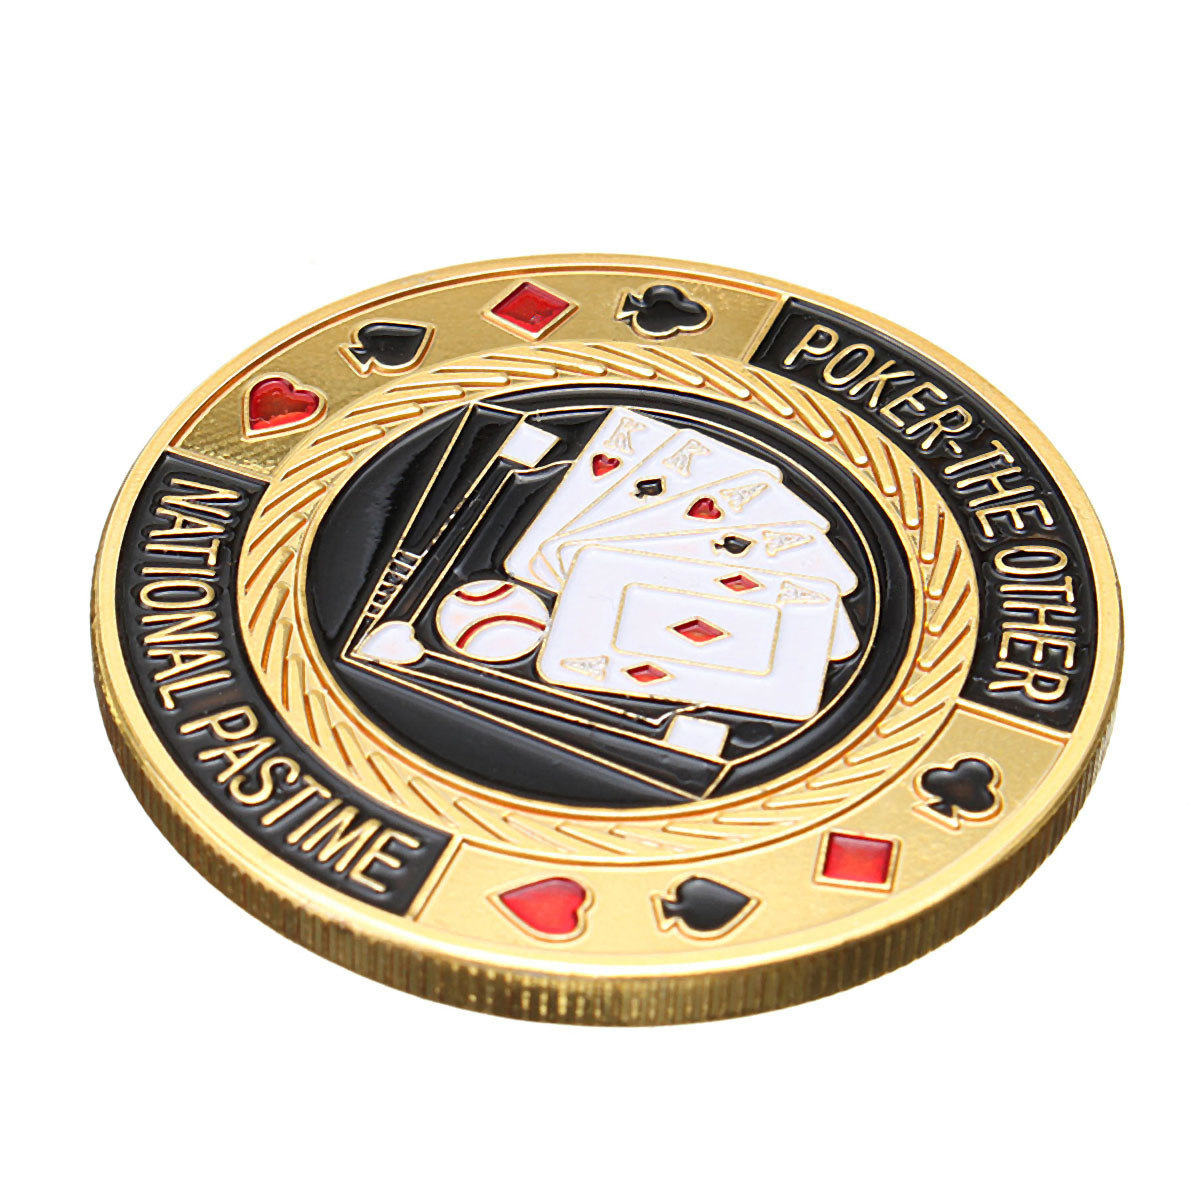 TEXAS Poker Card Guard Cover Protector Holder Casino Token Coin Chips Gold  ! !